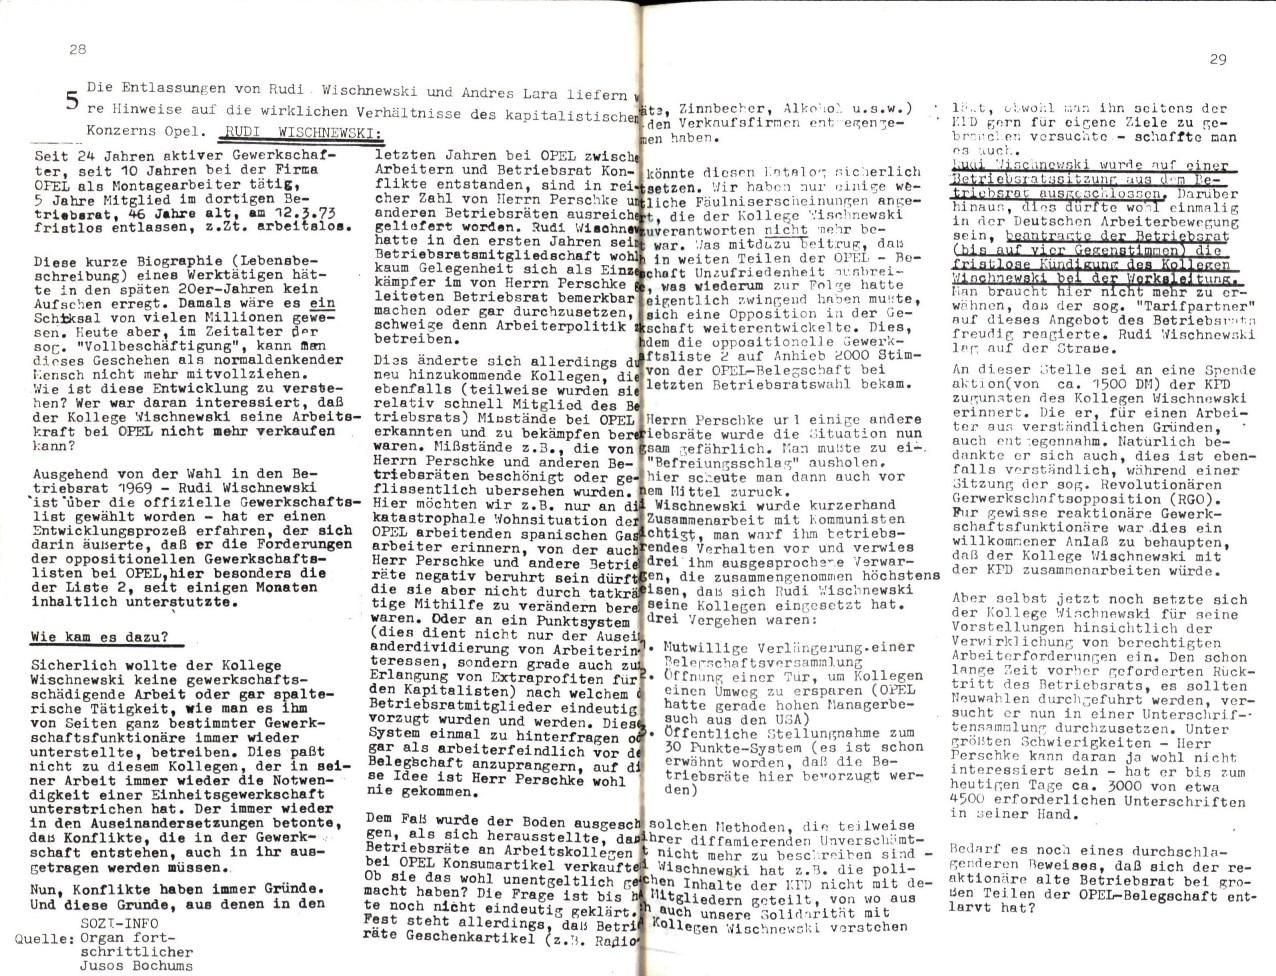 Bochum_IGM_Opel_PG_Opel_streikt_1973_016